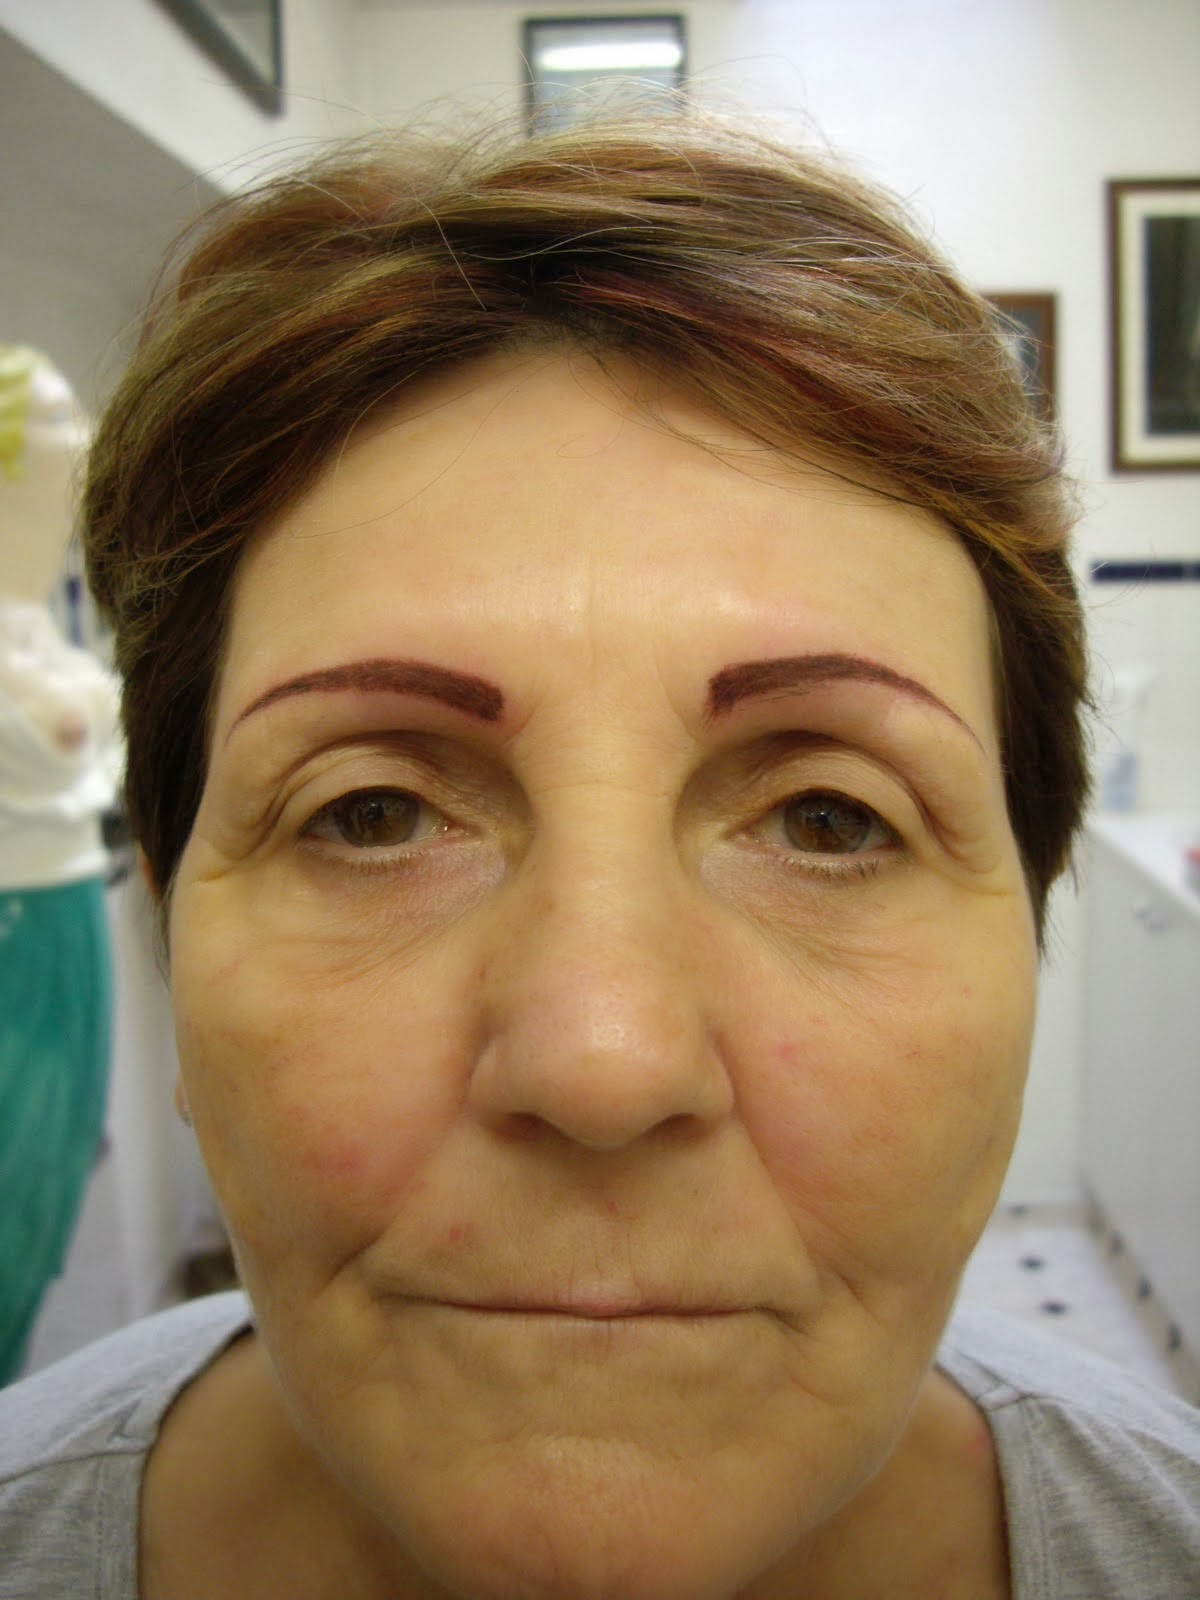 Meagan Good Tattooed Eyebrows Beauty Wallpaper